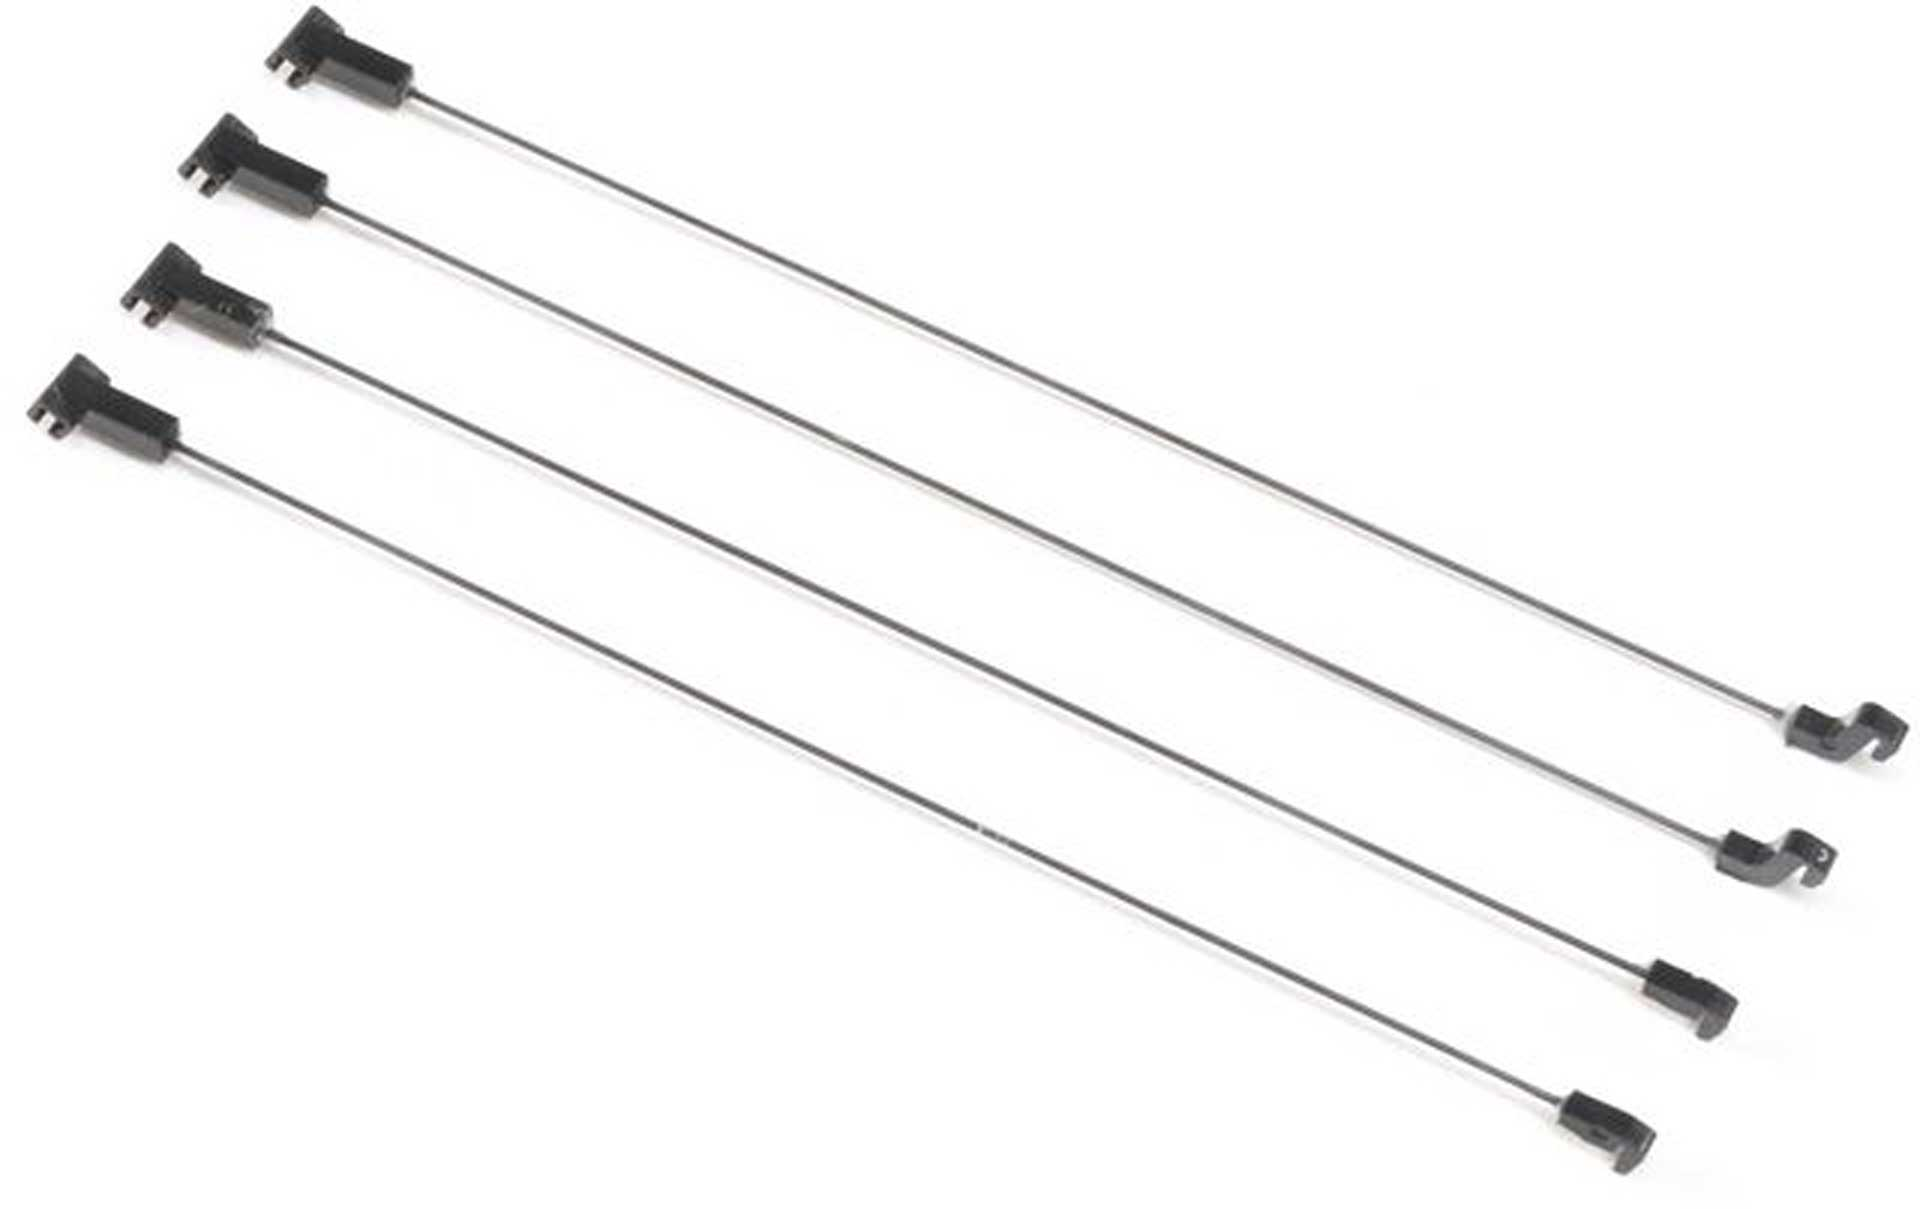 E-Flite Wing Strut Set: Night Vapor